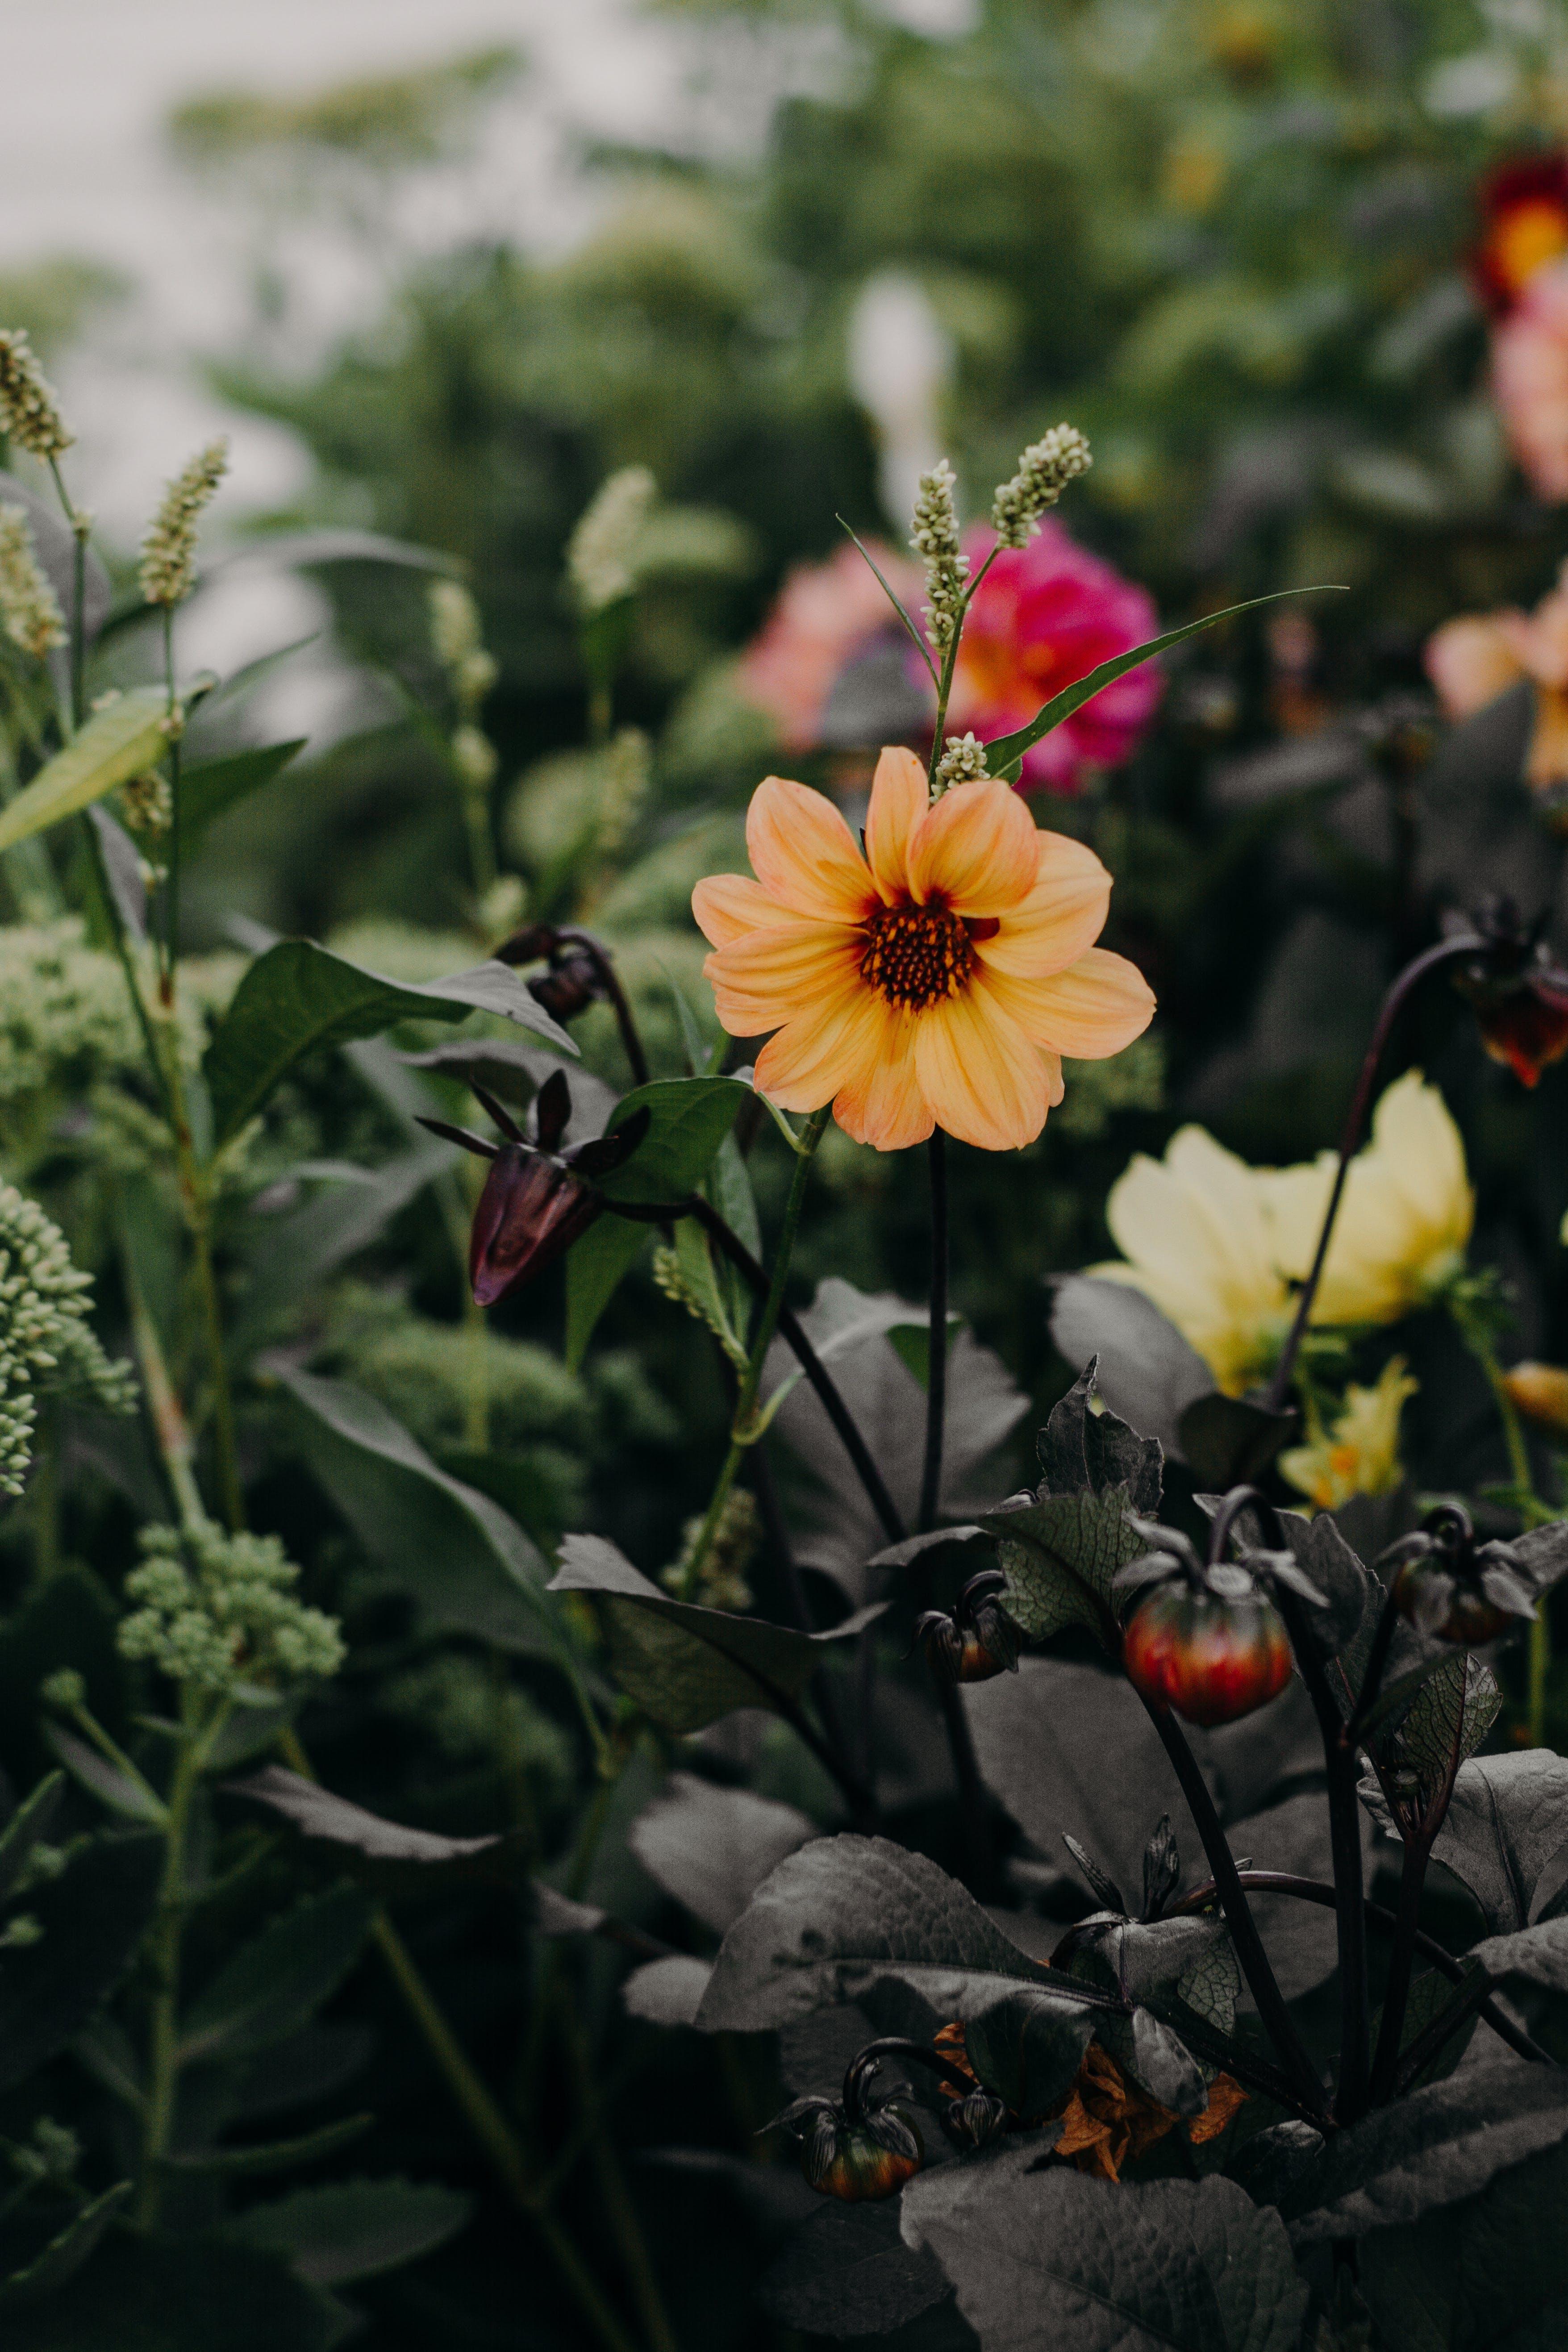 Selective Focus Photo of Orange Dahlia Flower